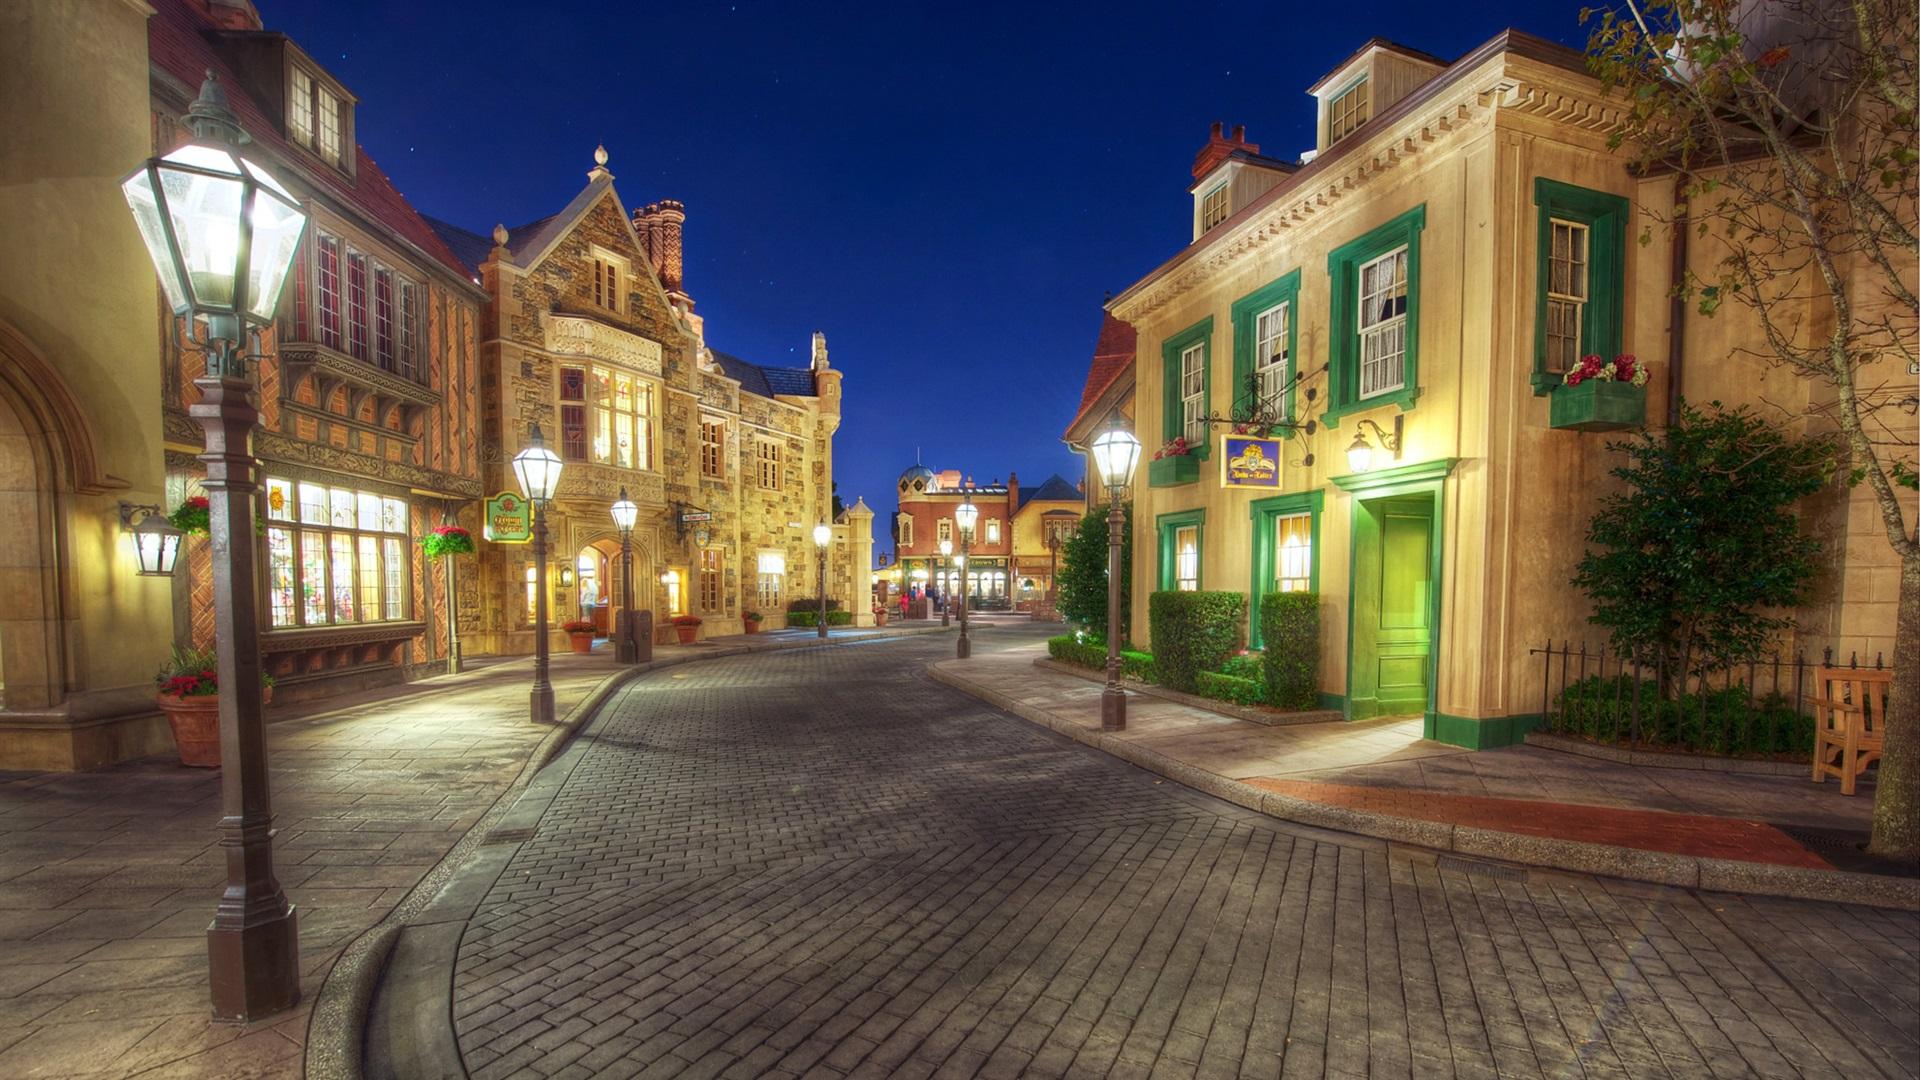 Wallpaper Disneyland Sidewalk Street Night Lights